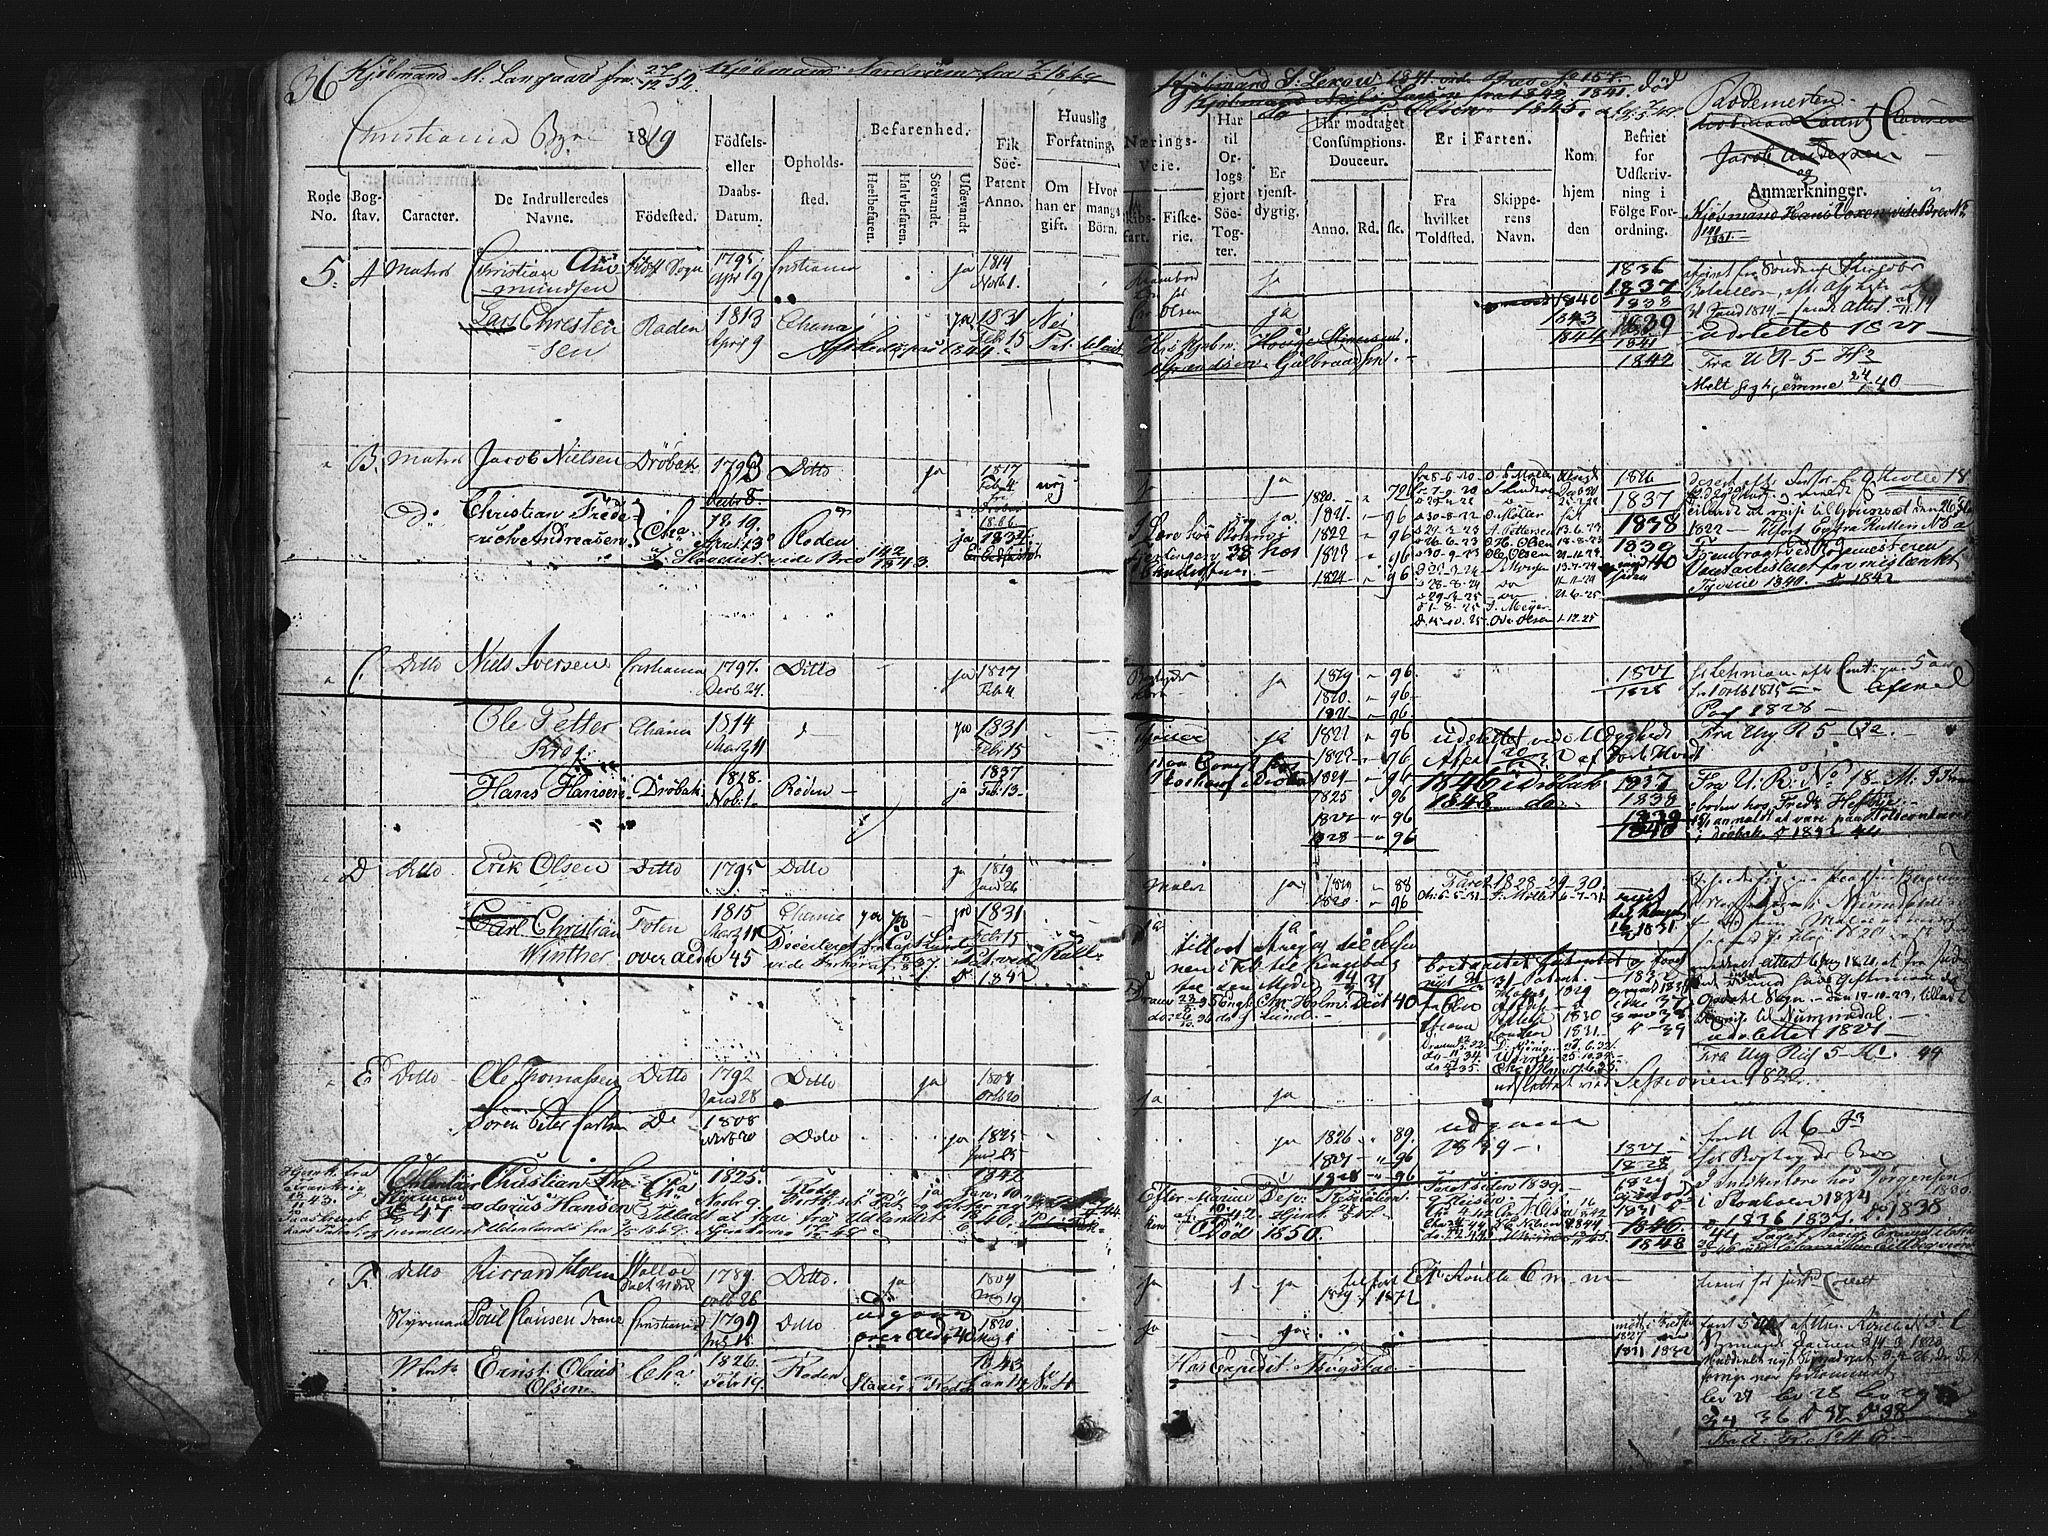 SAO, Oslo mønstringskontor, F/Fc/Fcb/L0001: Hovedrulle, 1819, s. 36